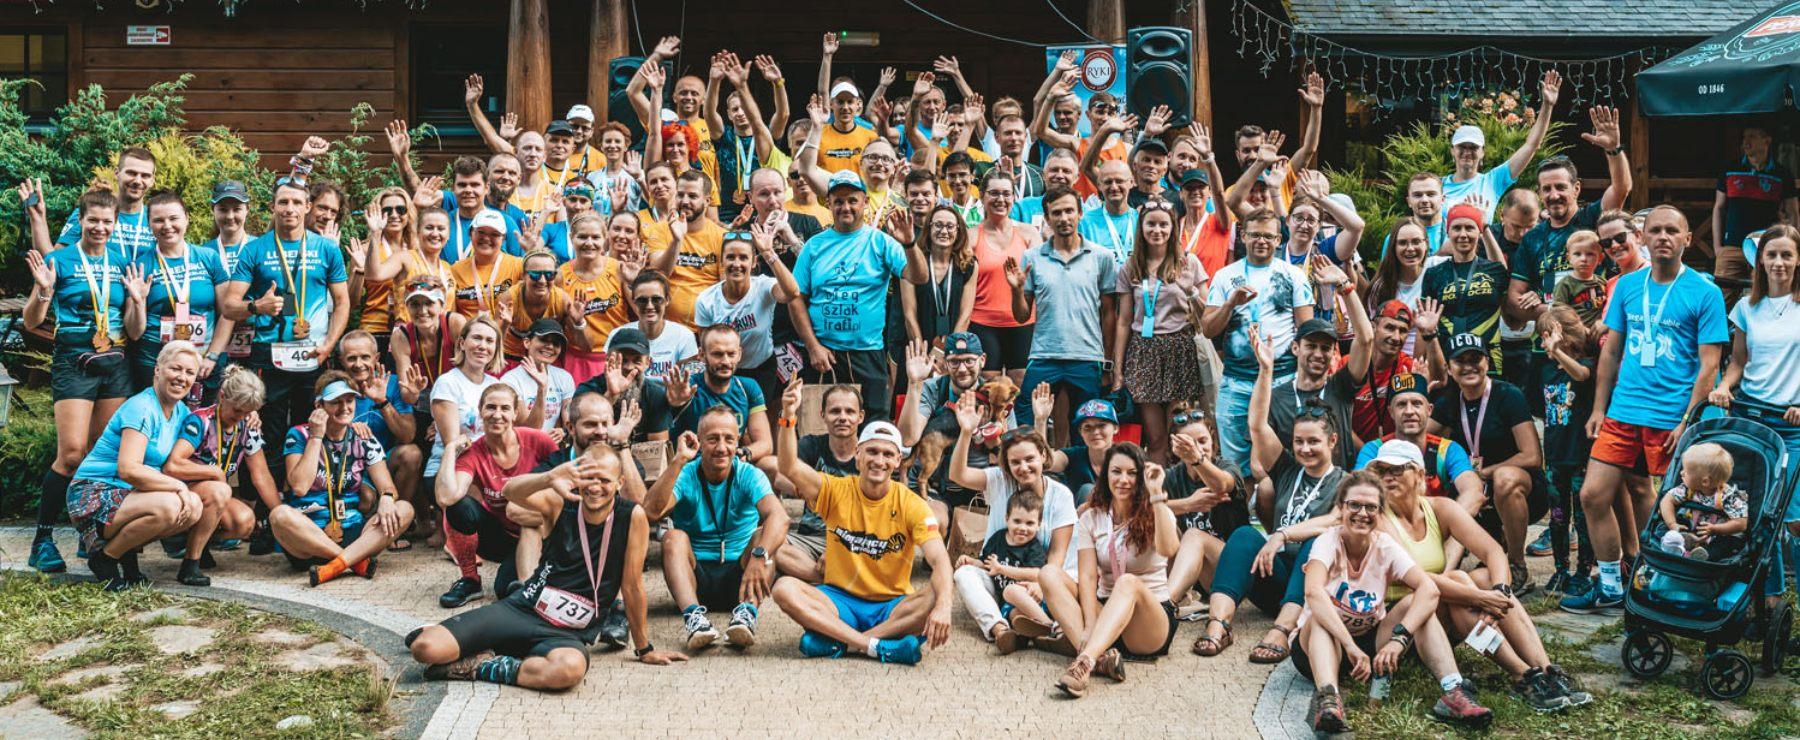 bieg-szlak-trafi-2021-polmaraton-maraton-ultramaraton